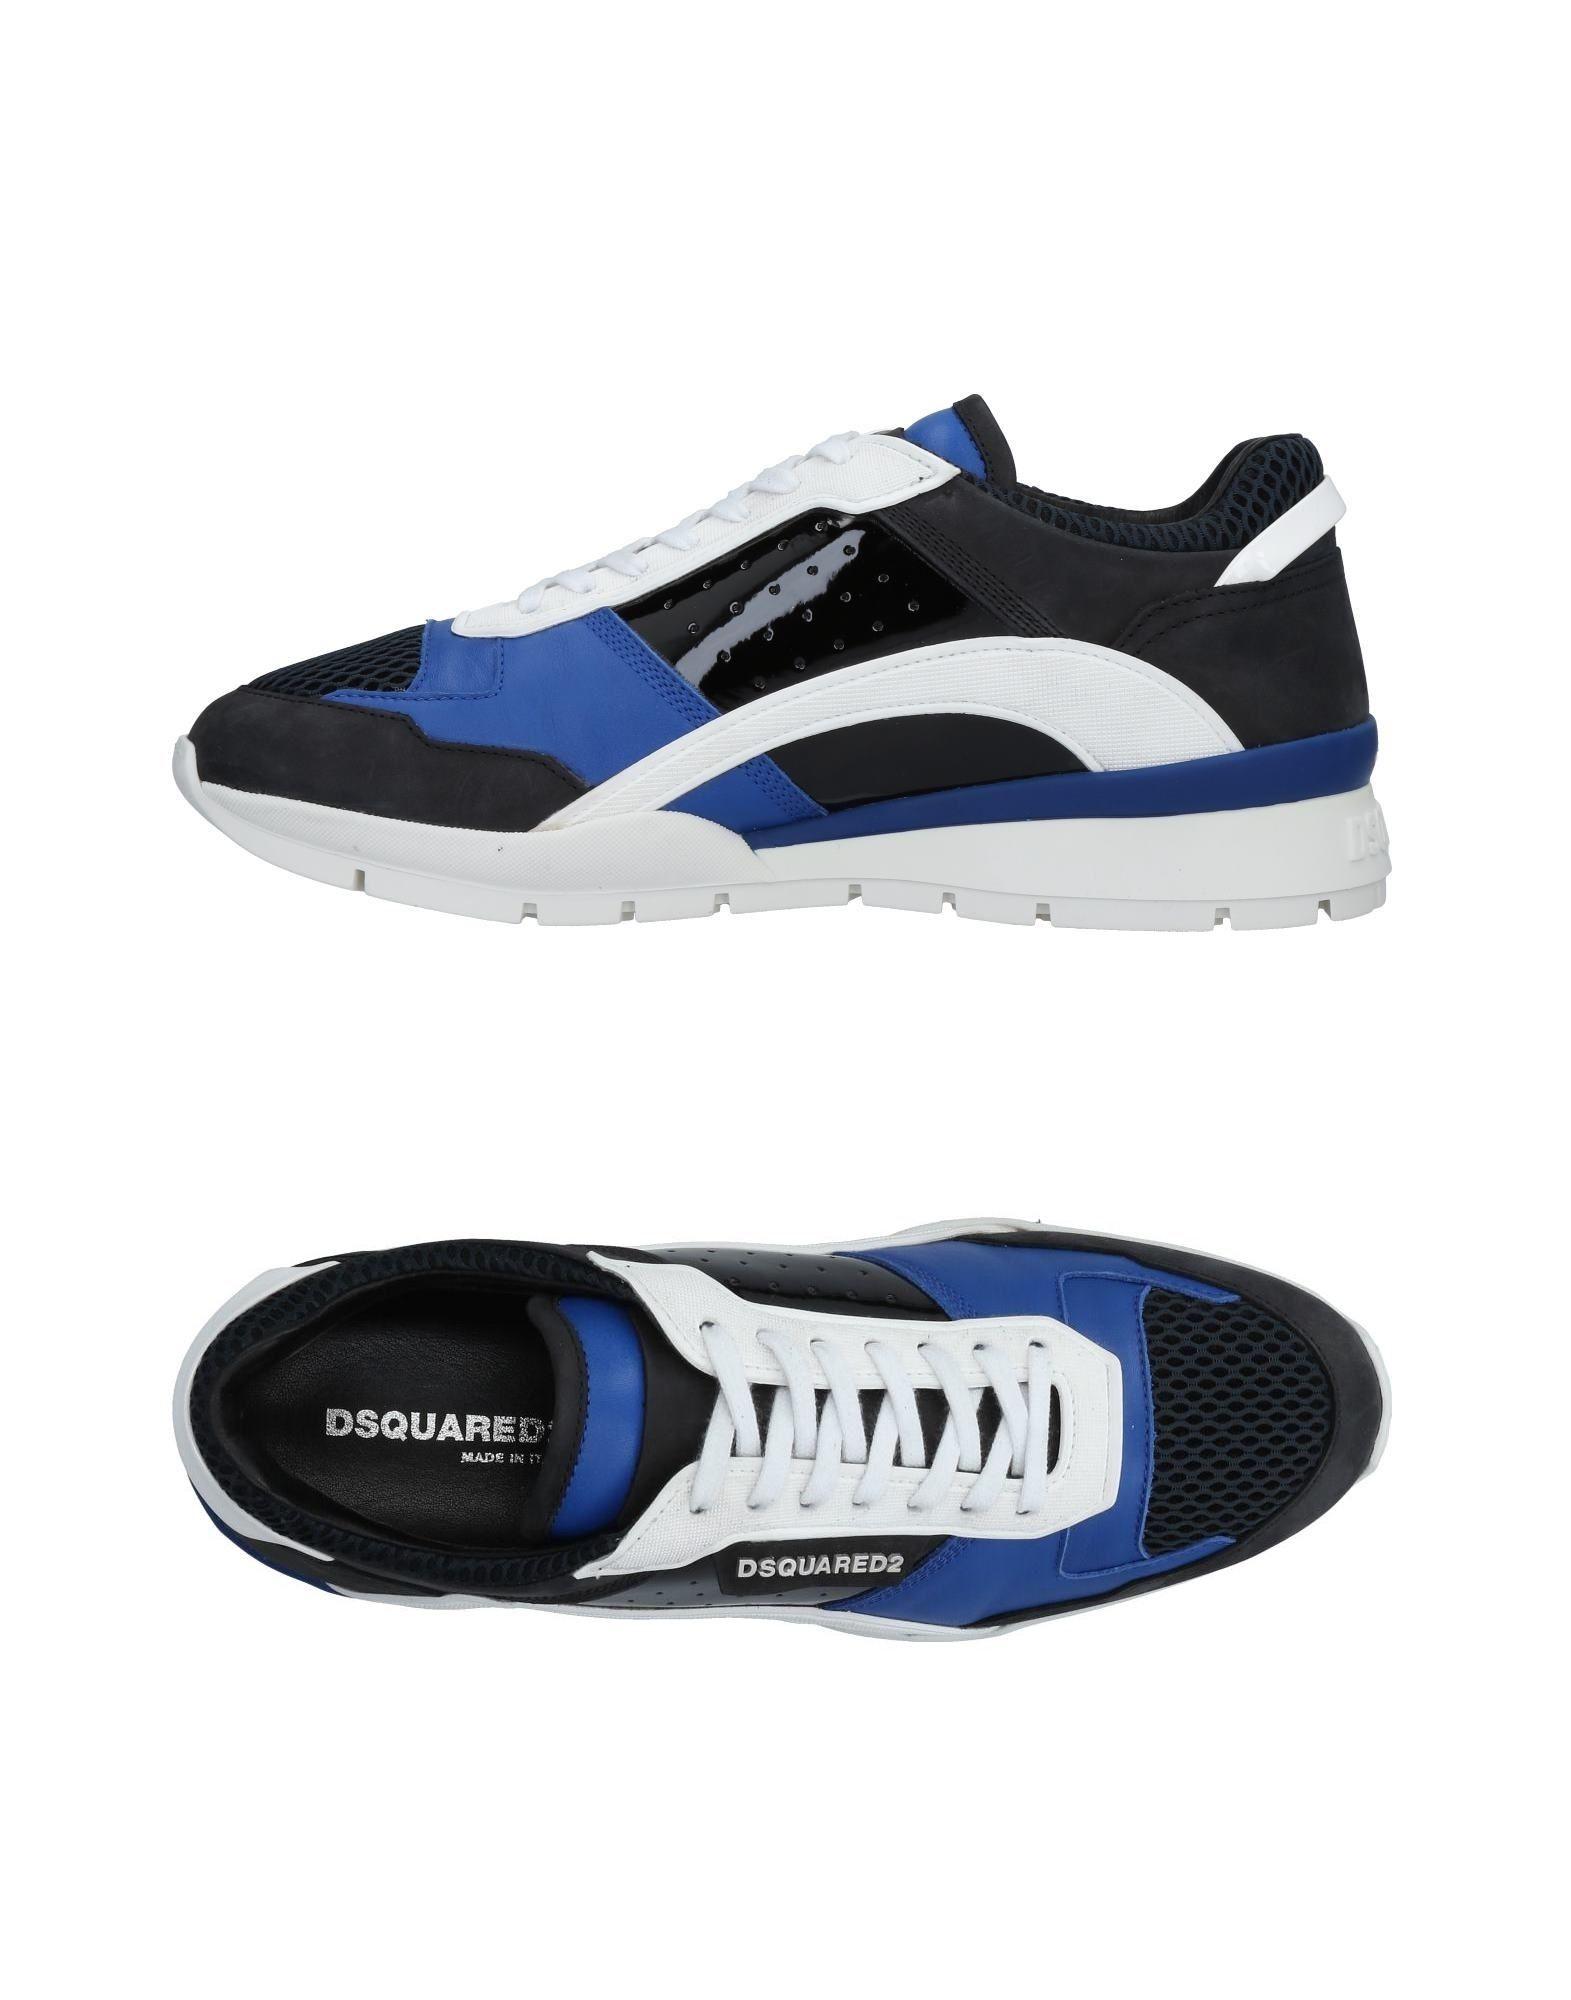 Dsquared2 Sneakers Herren  11479175BK Gute Qualität beliebte Schuhe